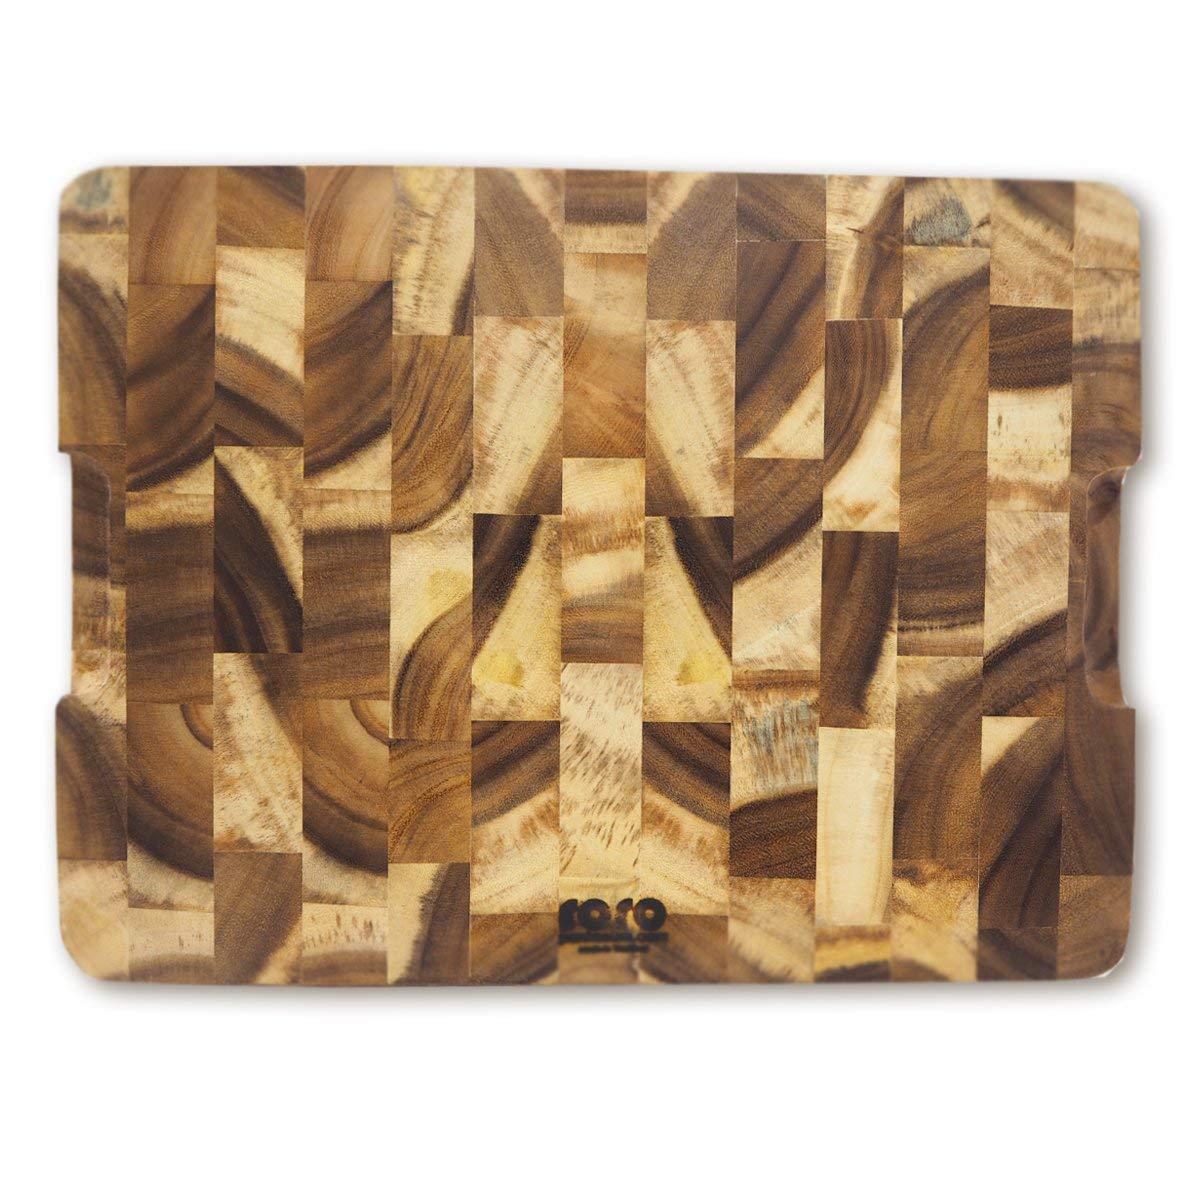 roro Rectangular End-Grain Acacia Kitchen Wood Cutting Board and Block by roro (Image #4)